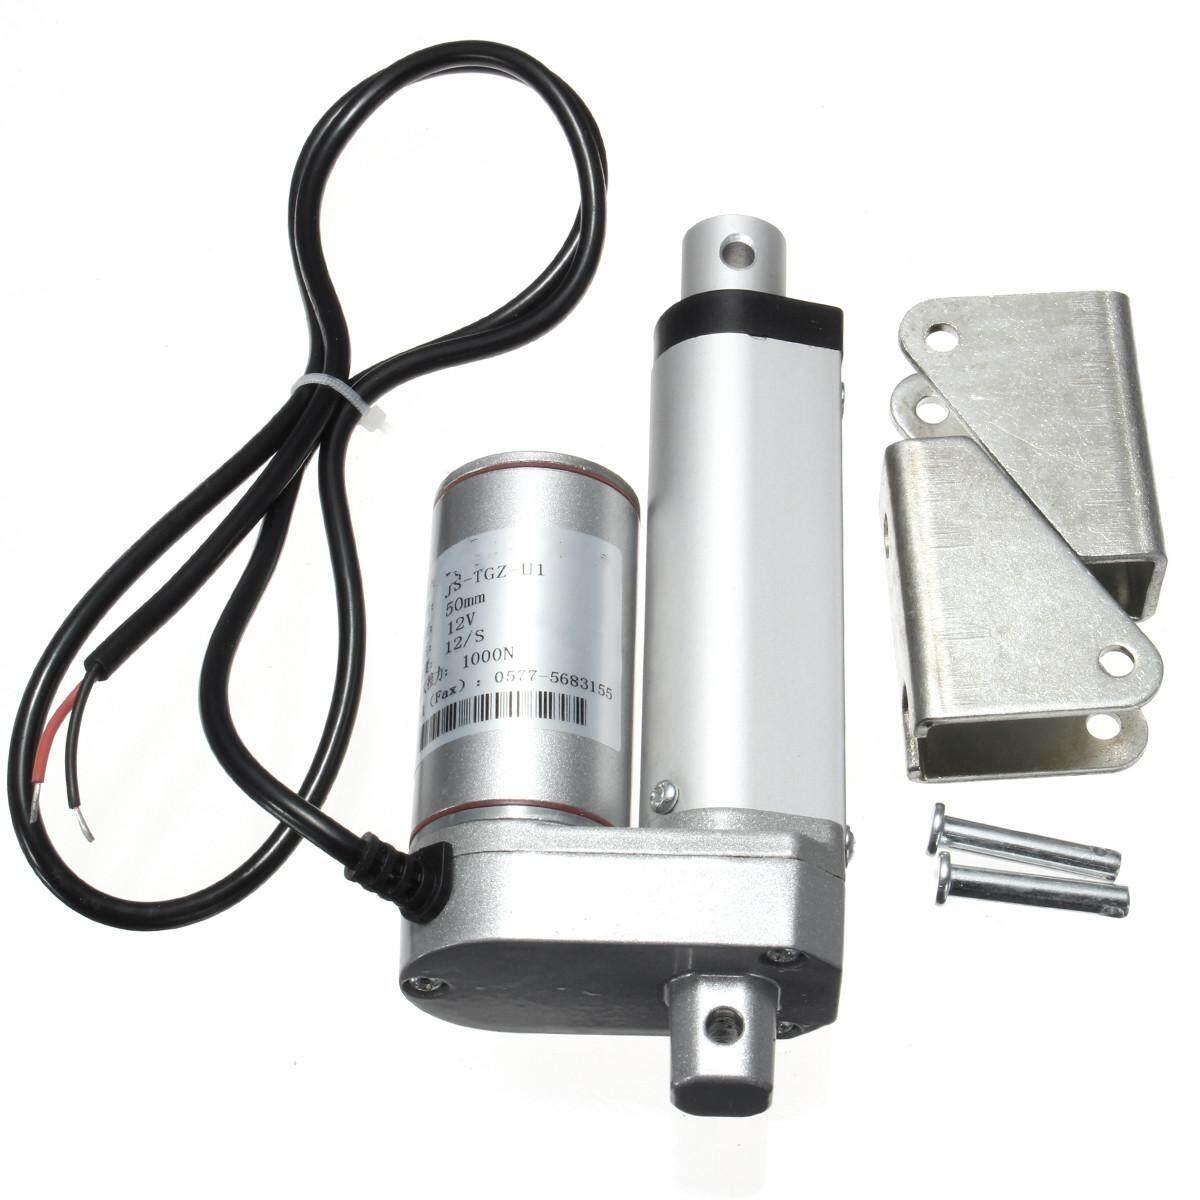 Heavy Duty 2 225lb 50mm Electric Linear Actuator Motor Putter 12V DC 1000N